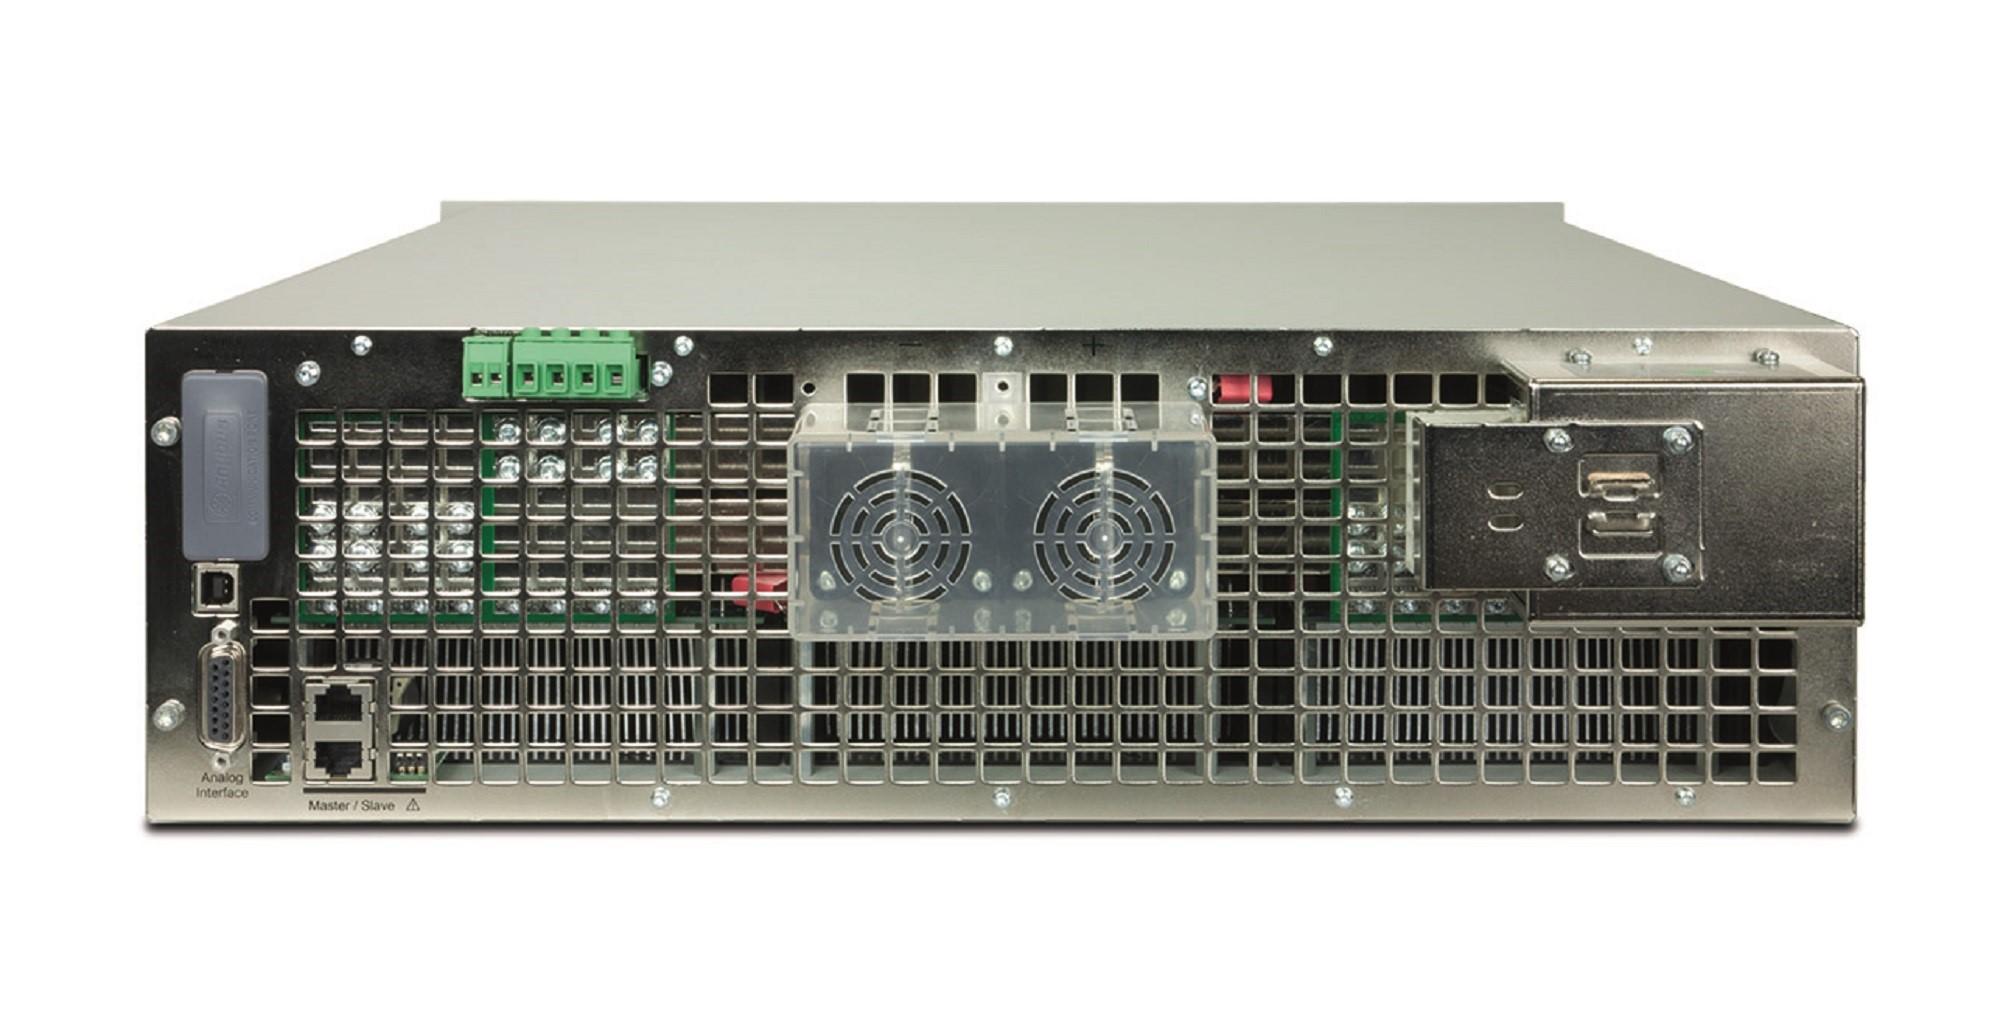 E/PSE 9040-170 3U Labornetzgerät